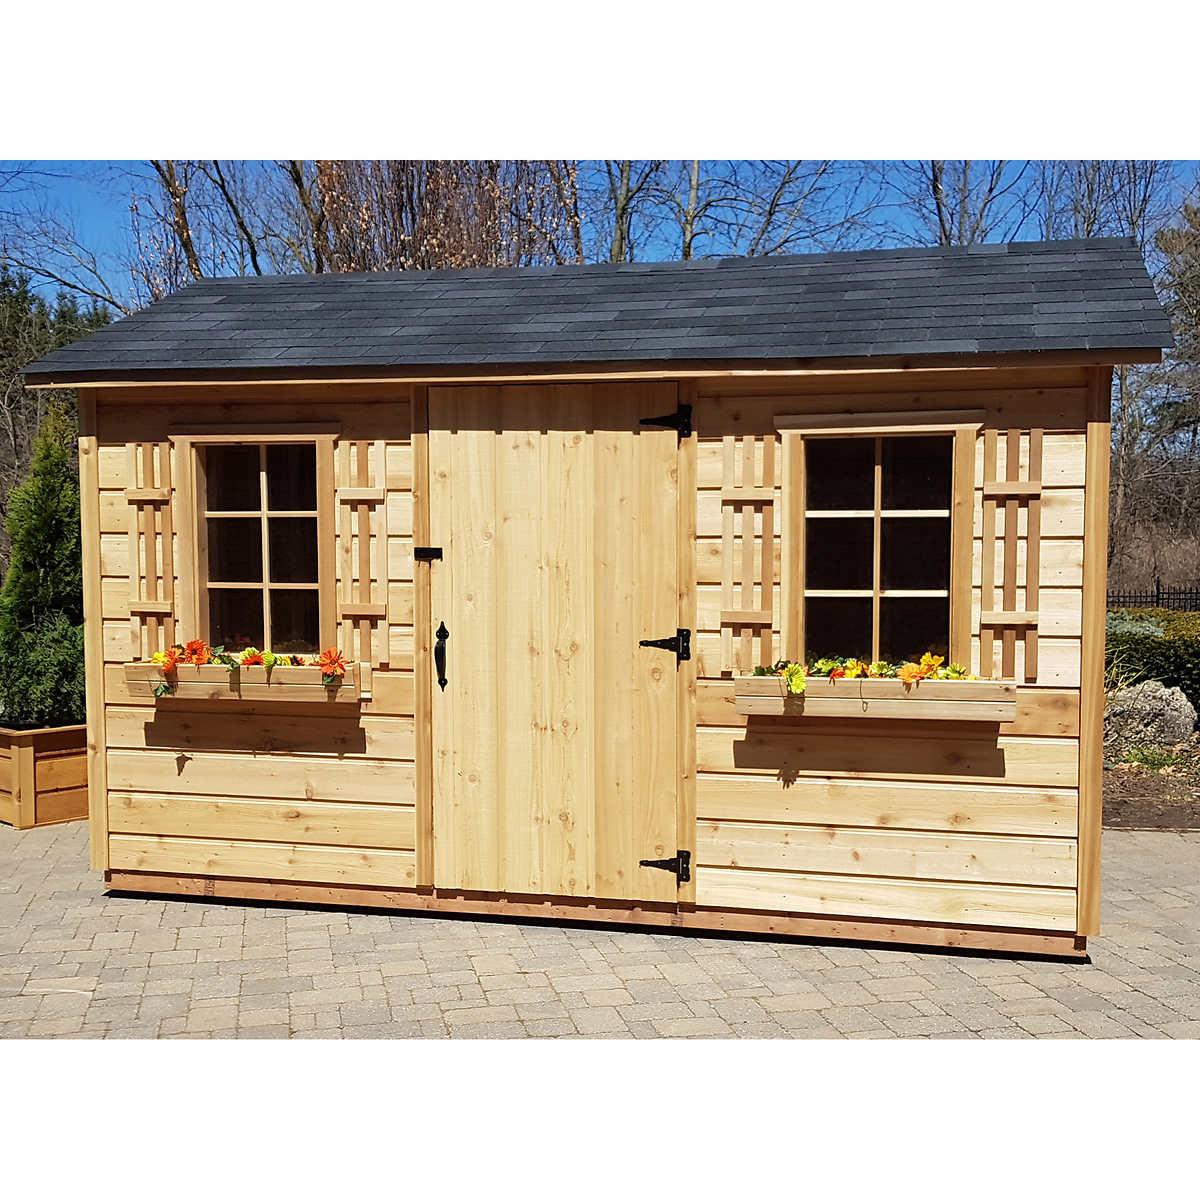 Garden Sheds 8 X 12 designs garden sheds ontario. lee sheds. prefab garages. garden